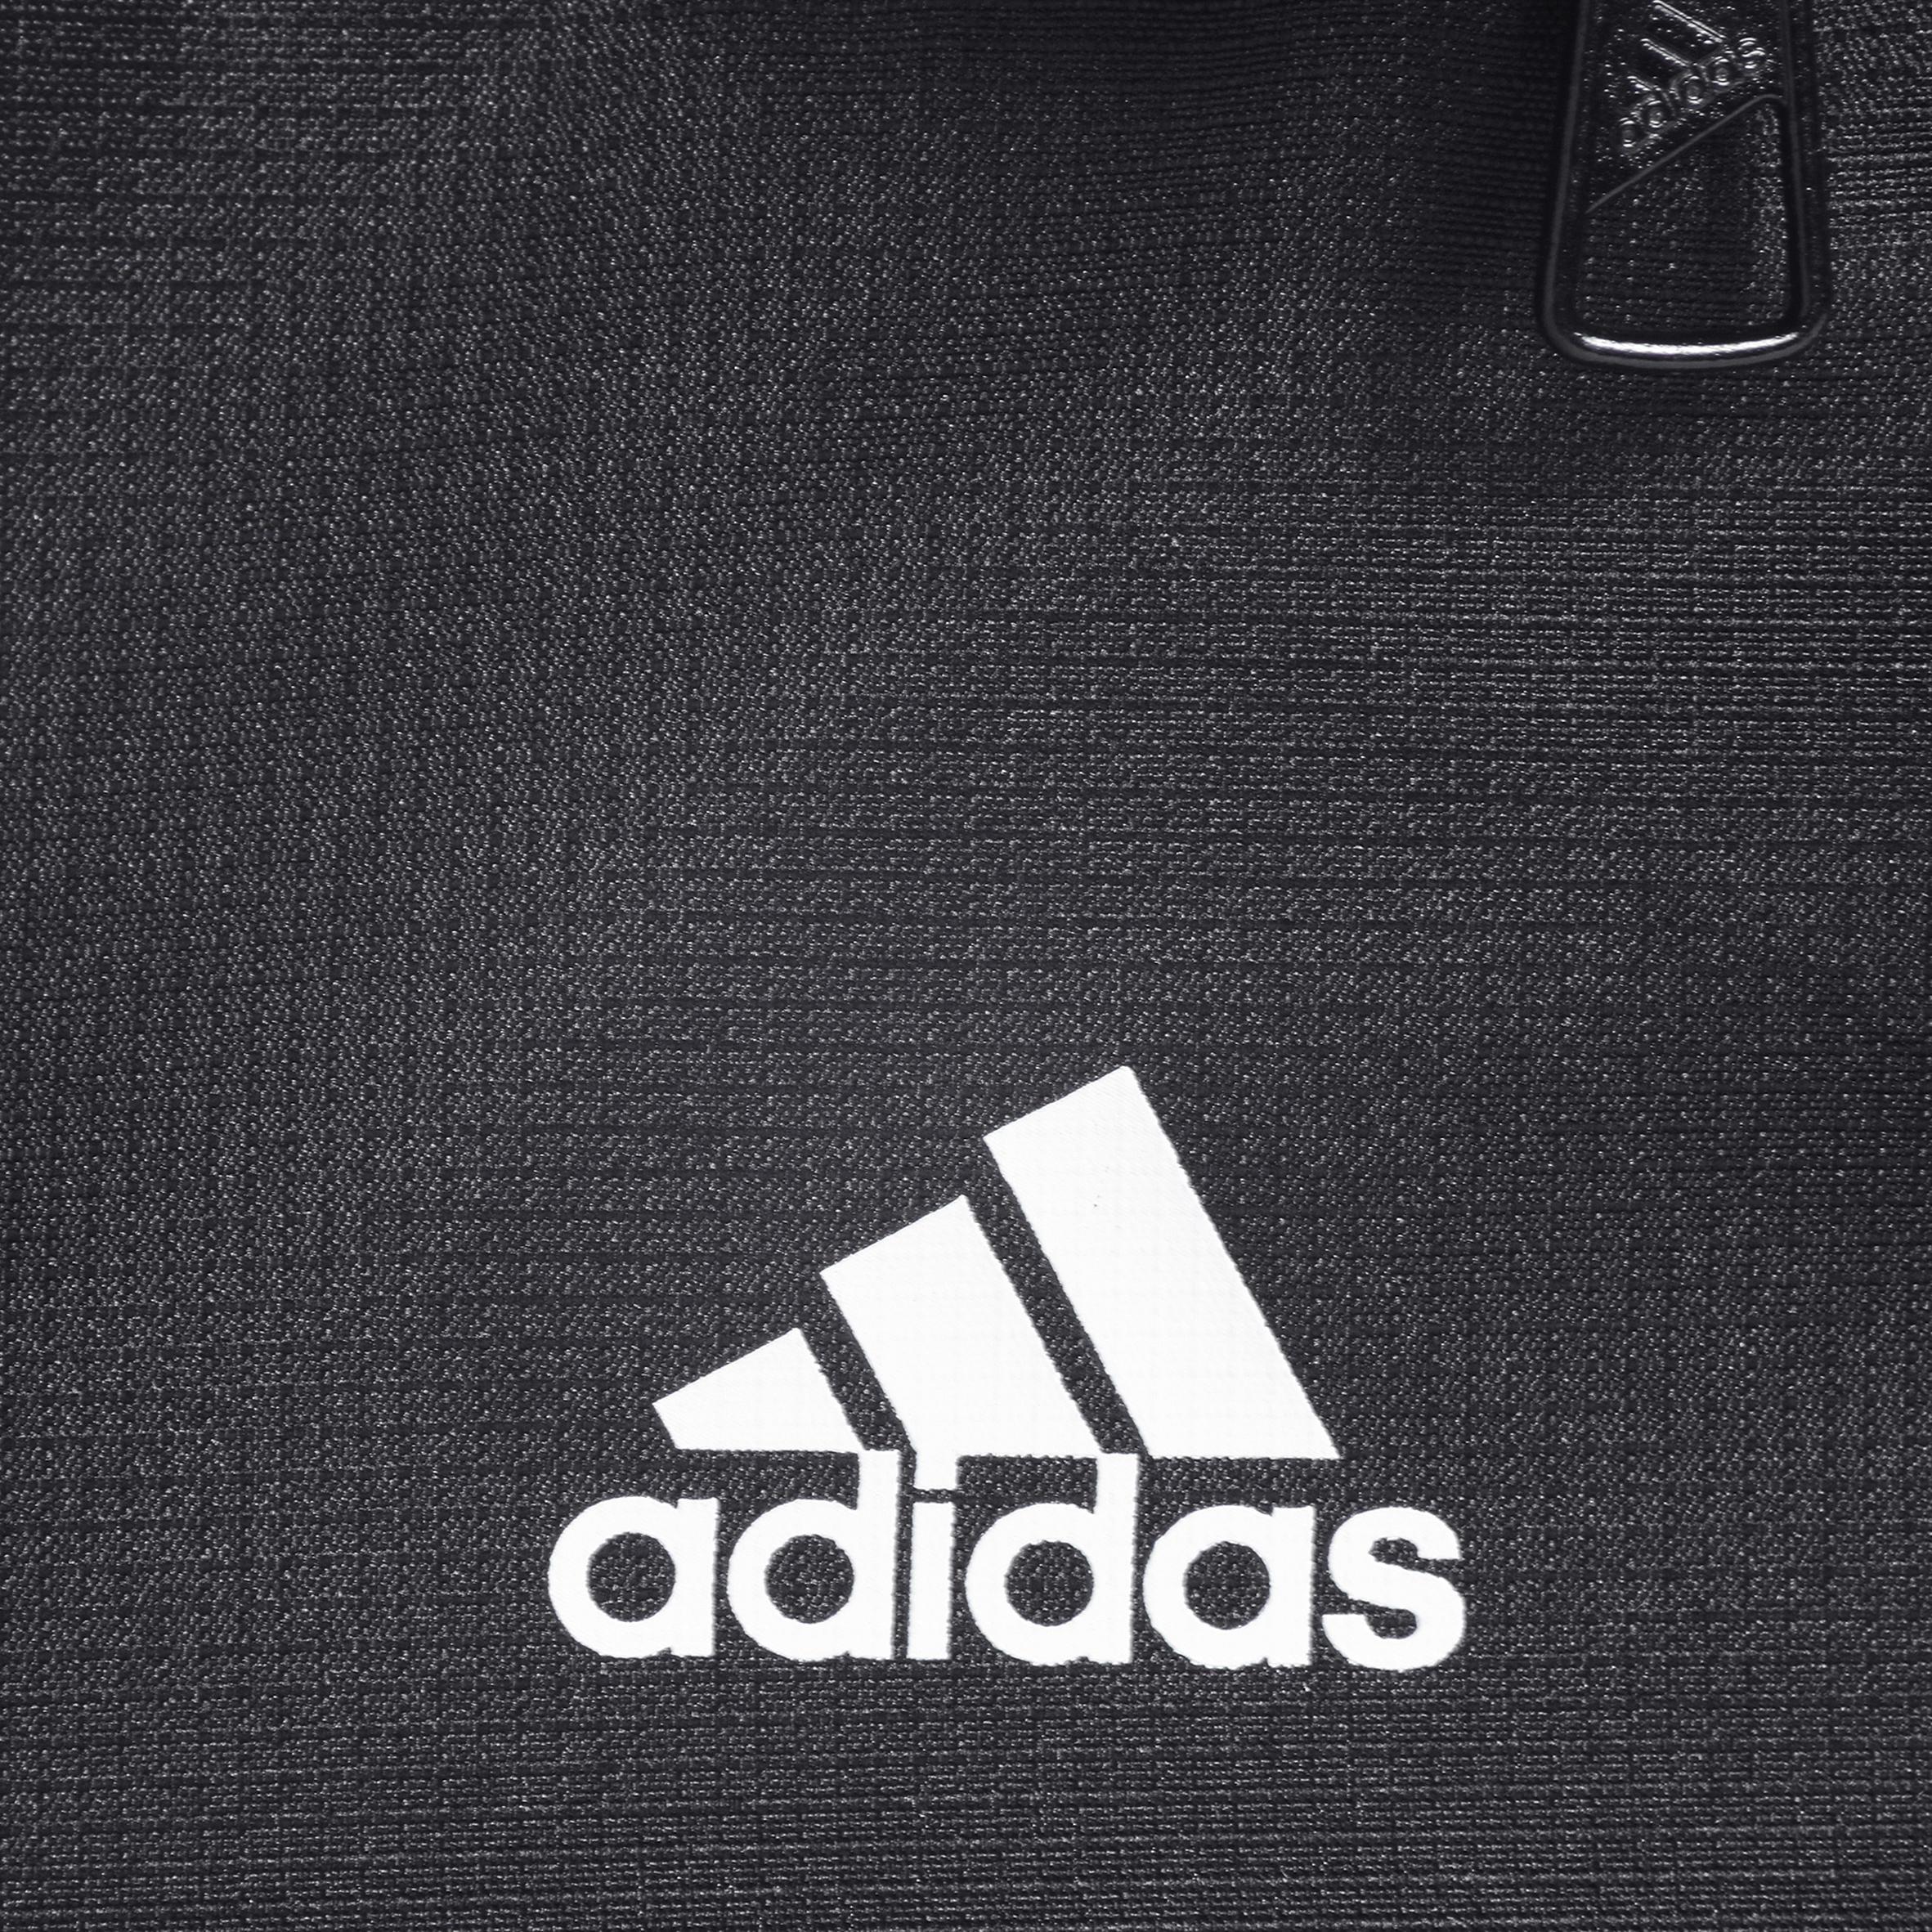 Xs Et Junior Adidas Noir Blanc Sac Fitness Yy7vbI6fg